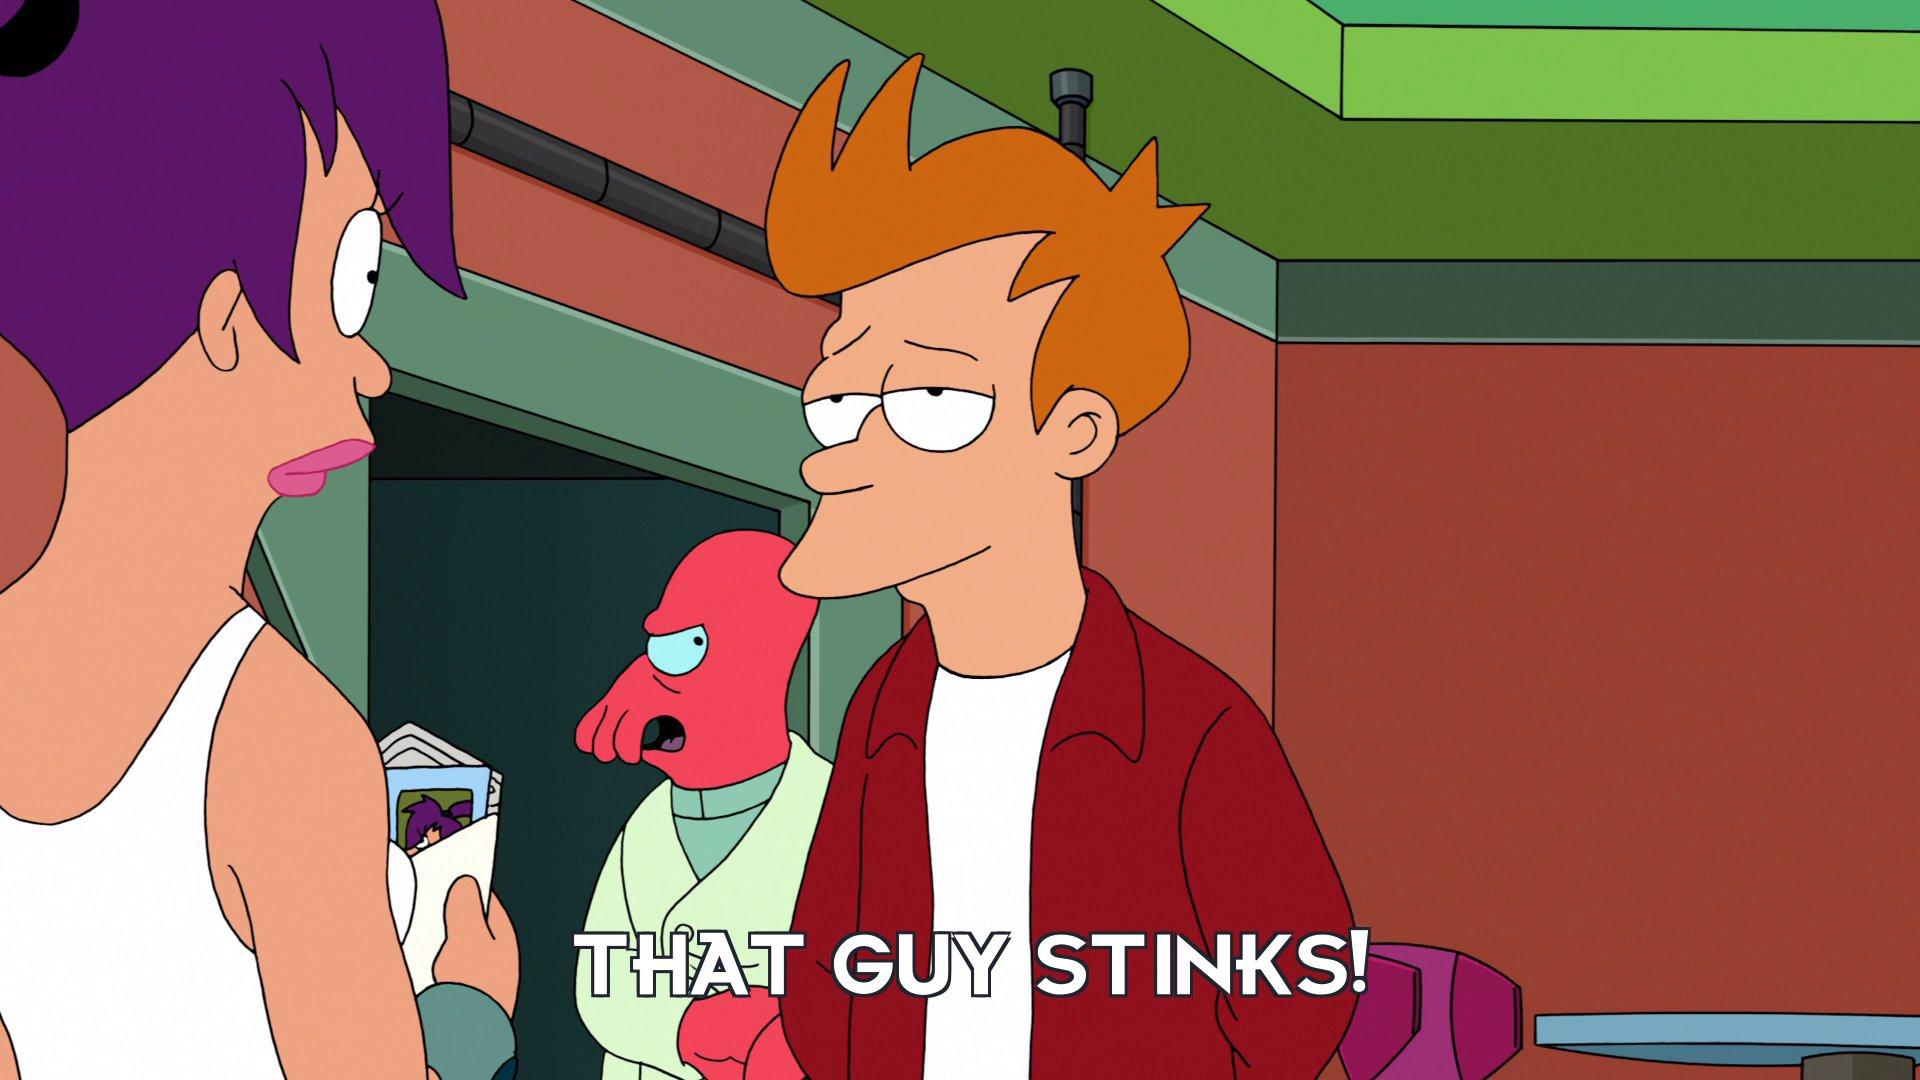 Dr John A Zoidberg: That guy stinks!